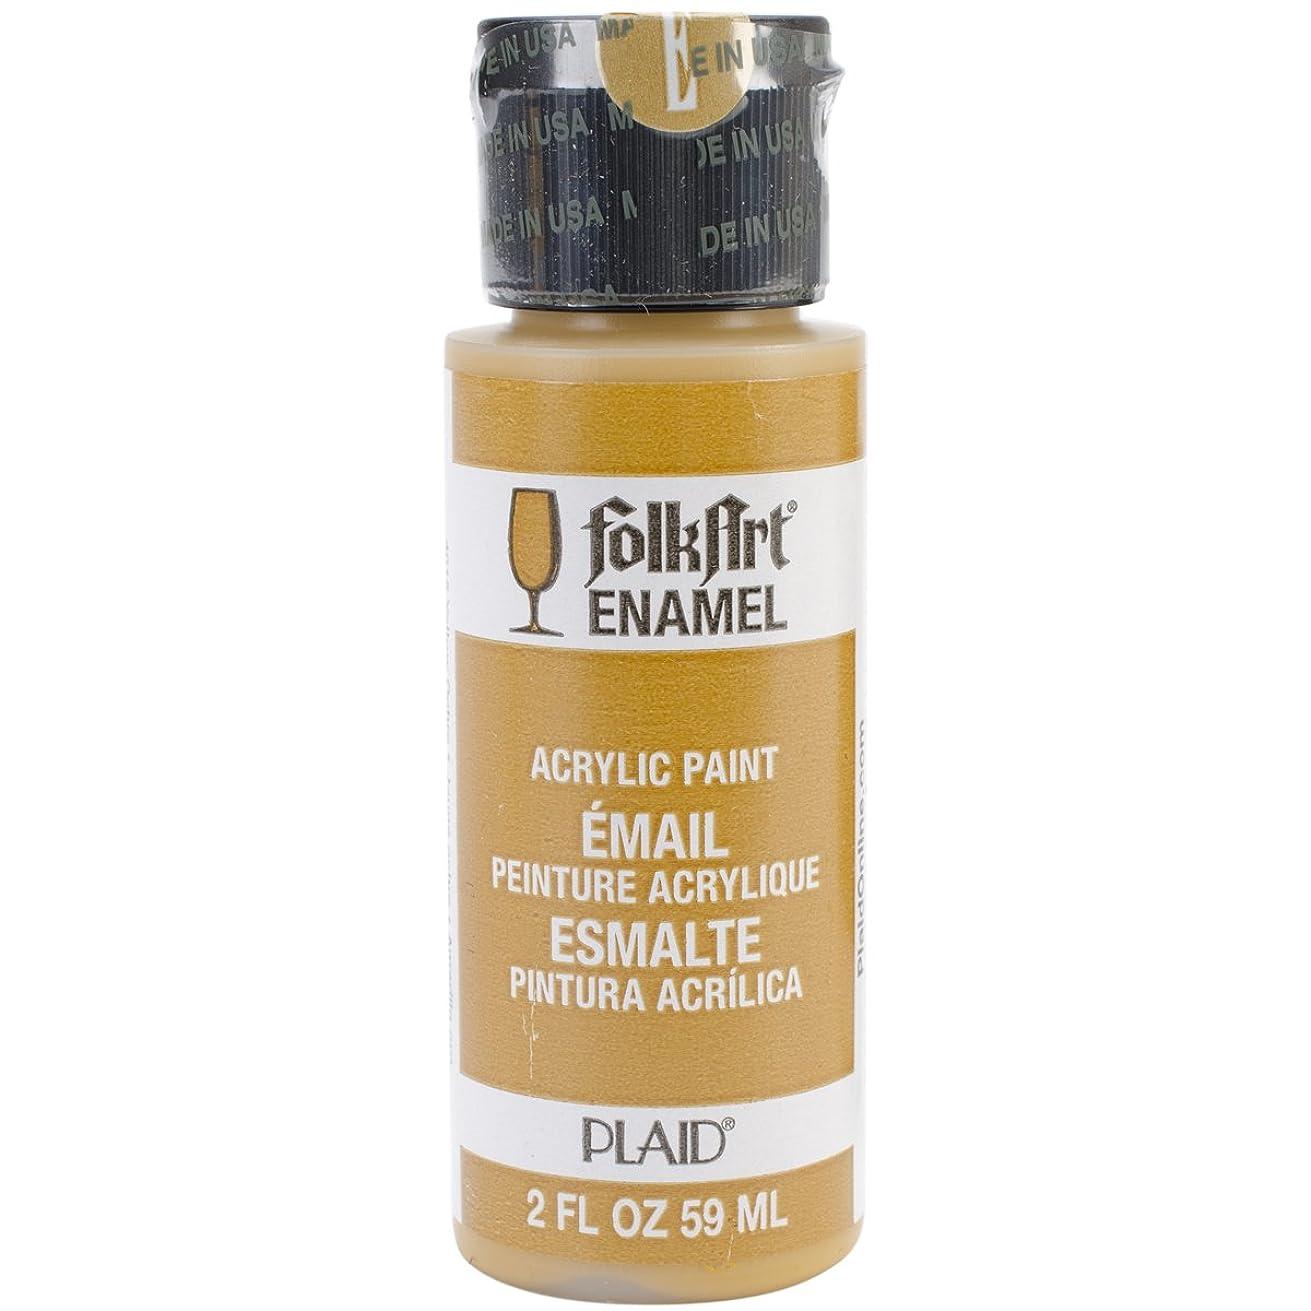 FolkArt Enamel Glass & Ceramic Paint in Assorted Colors (2 oz), 4015, Yellow Ochre